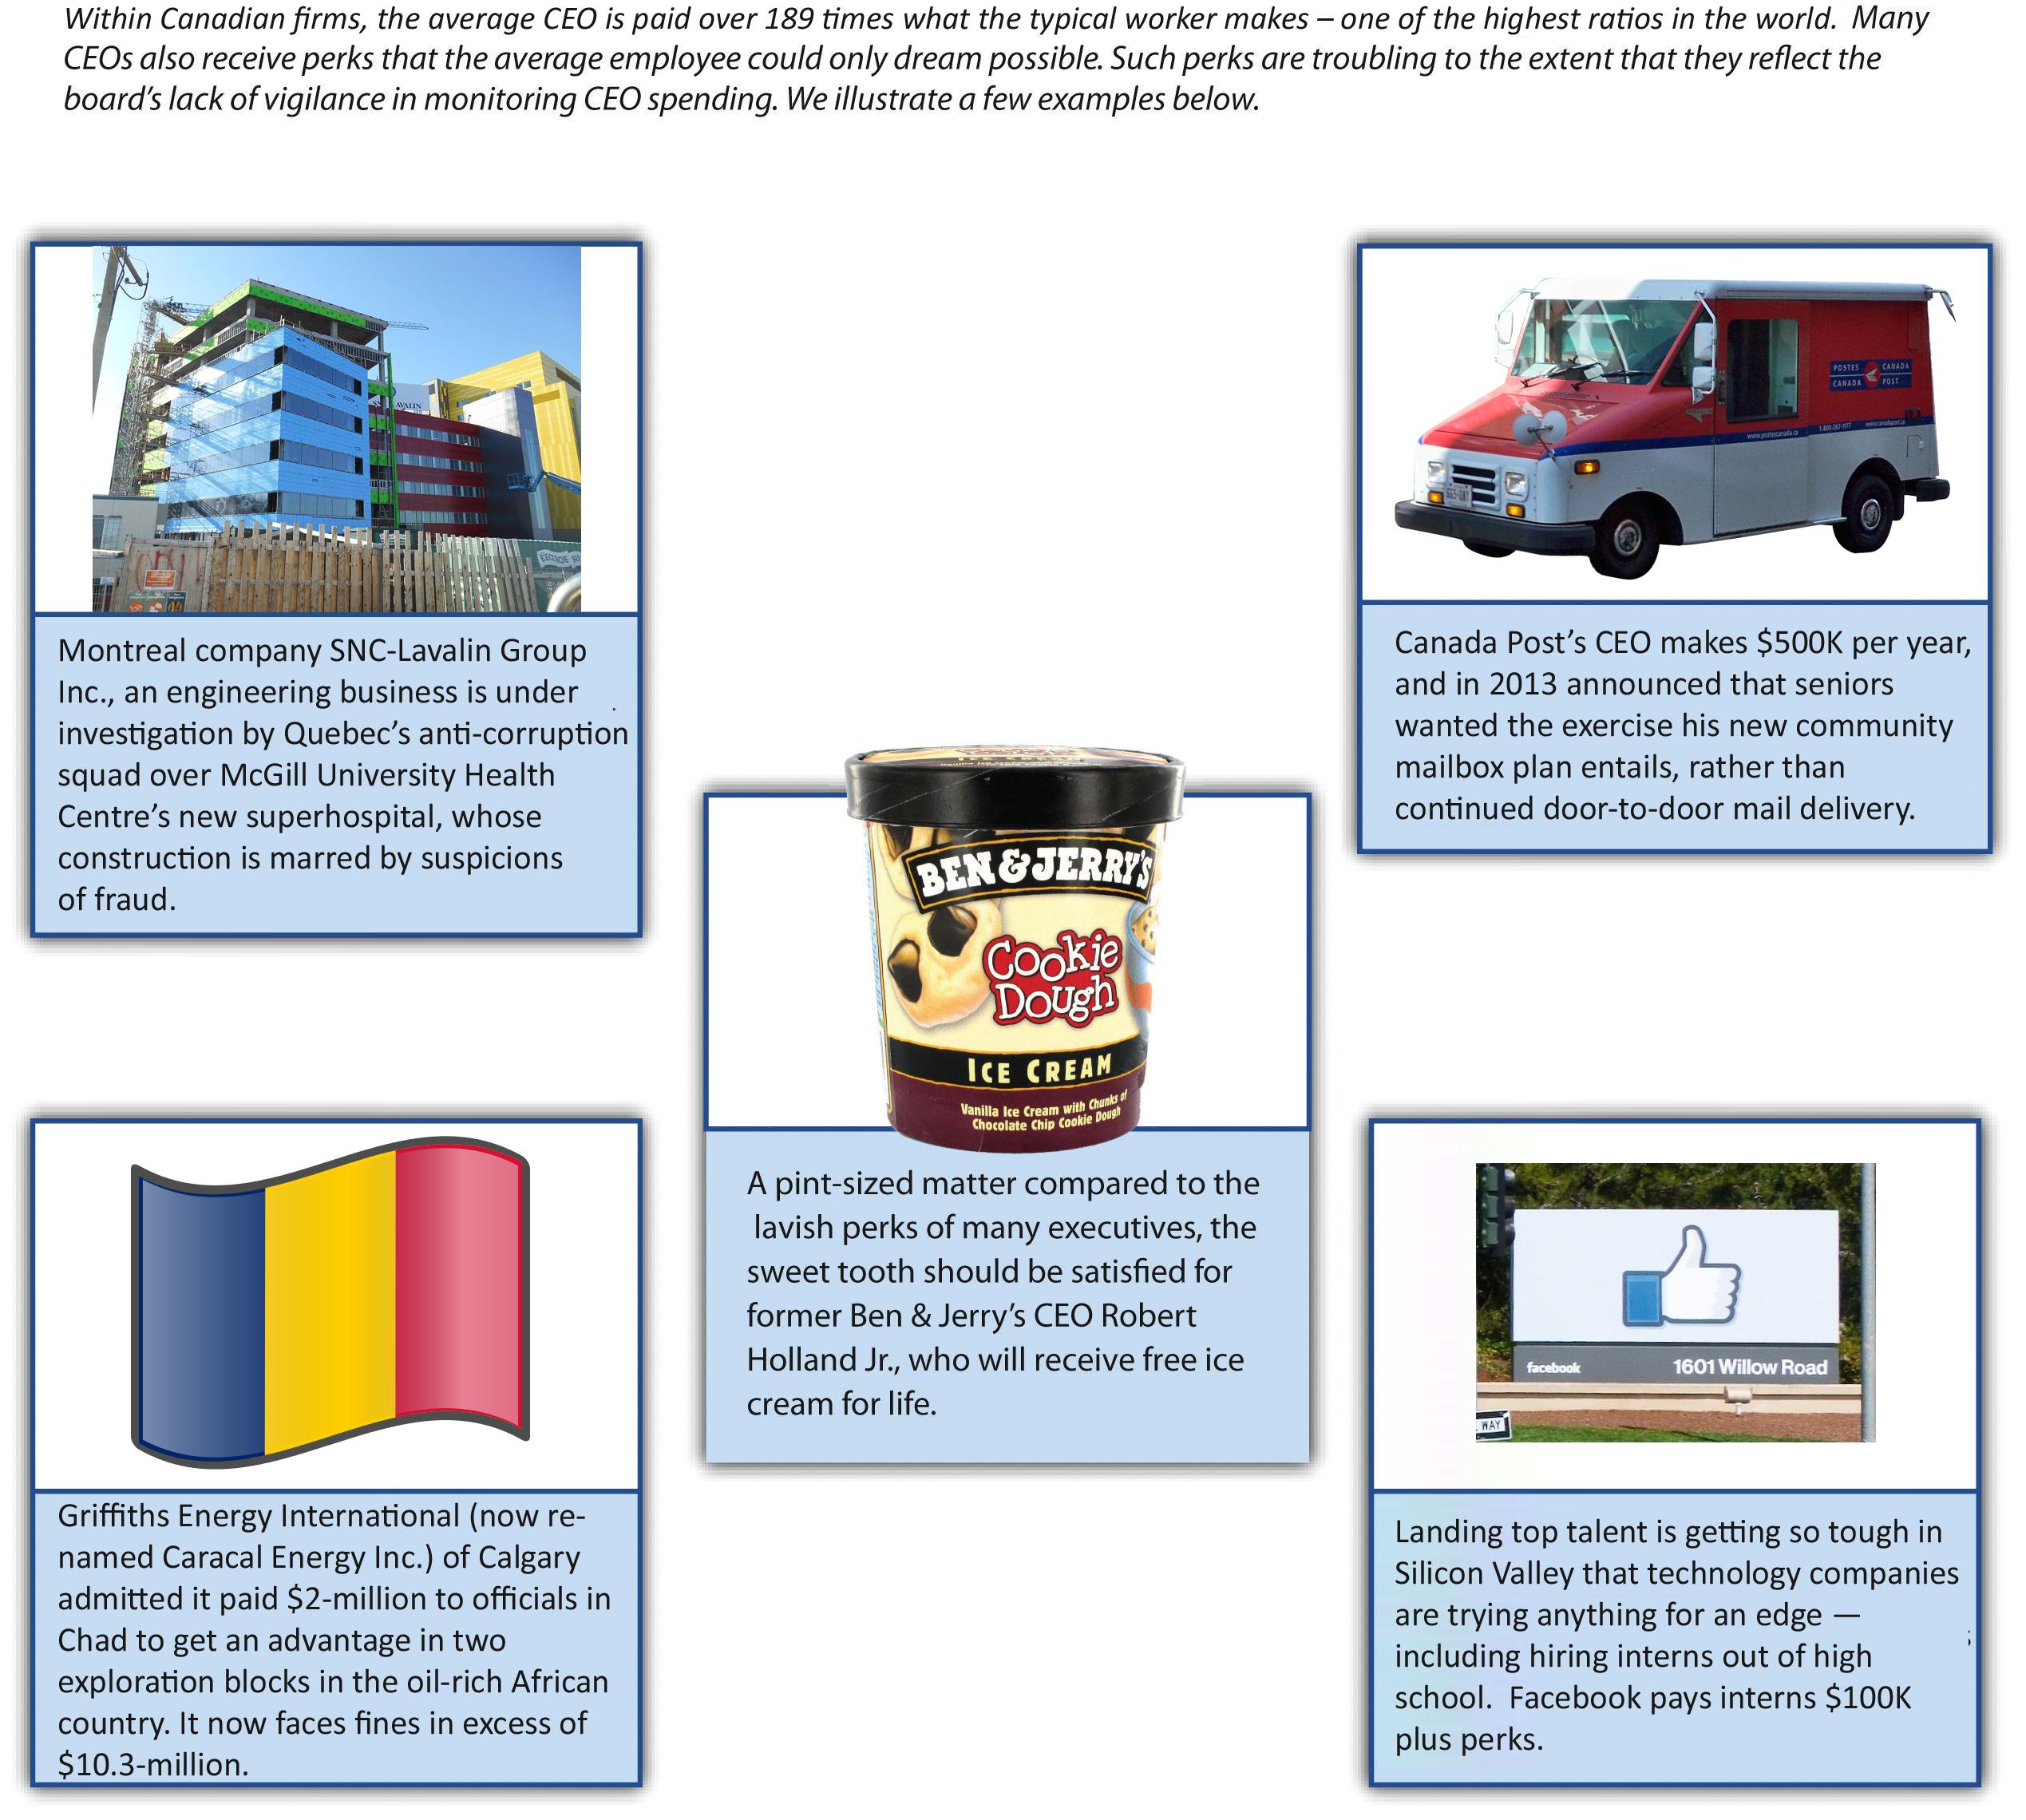 Figure 10-3: CEO Perks, image description available